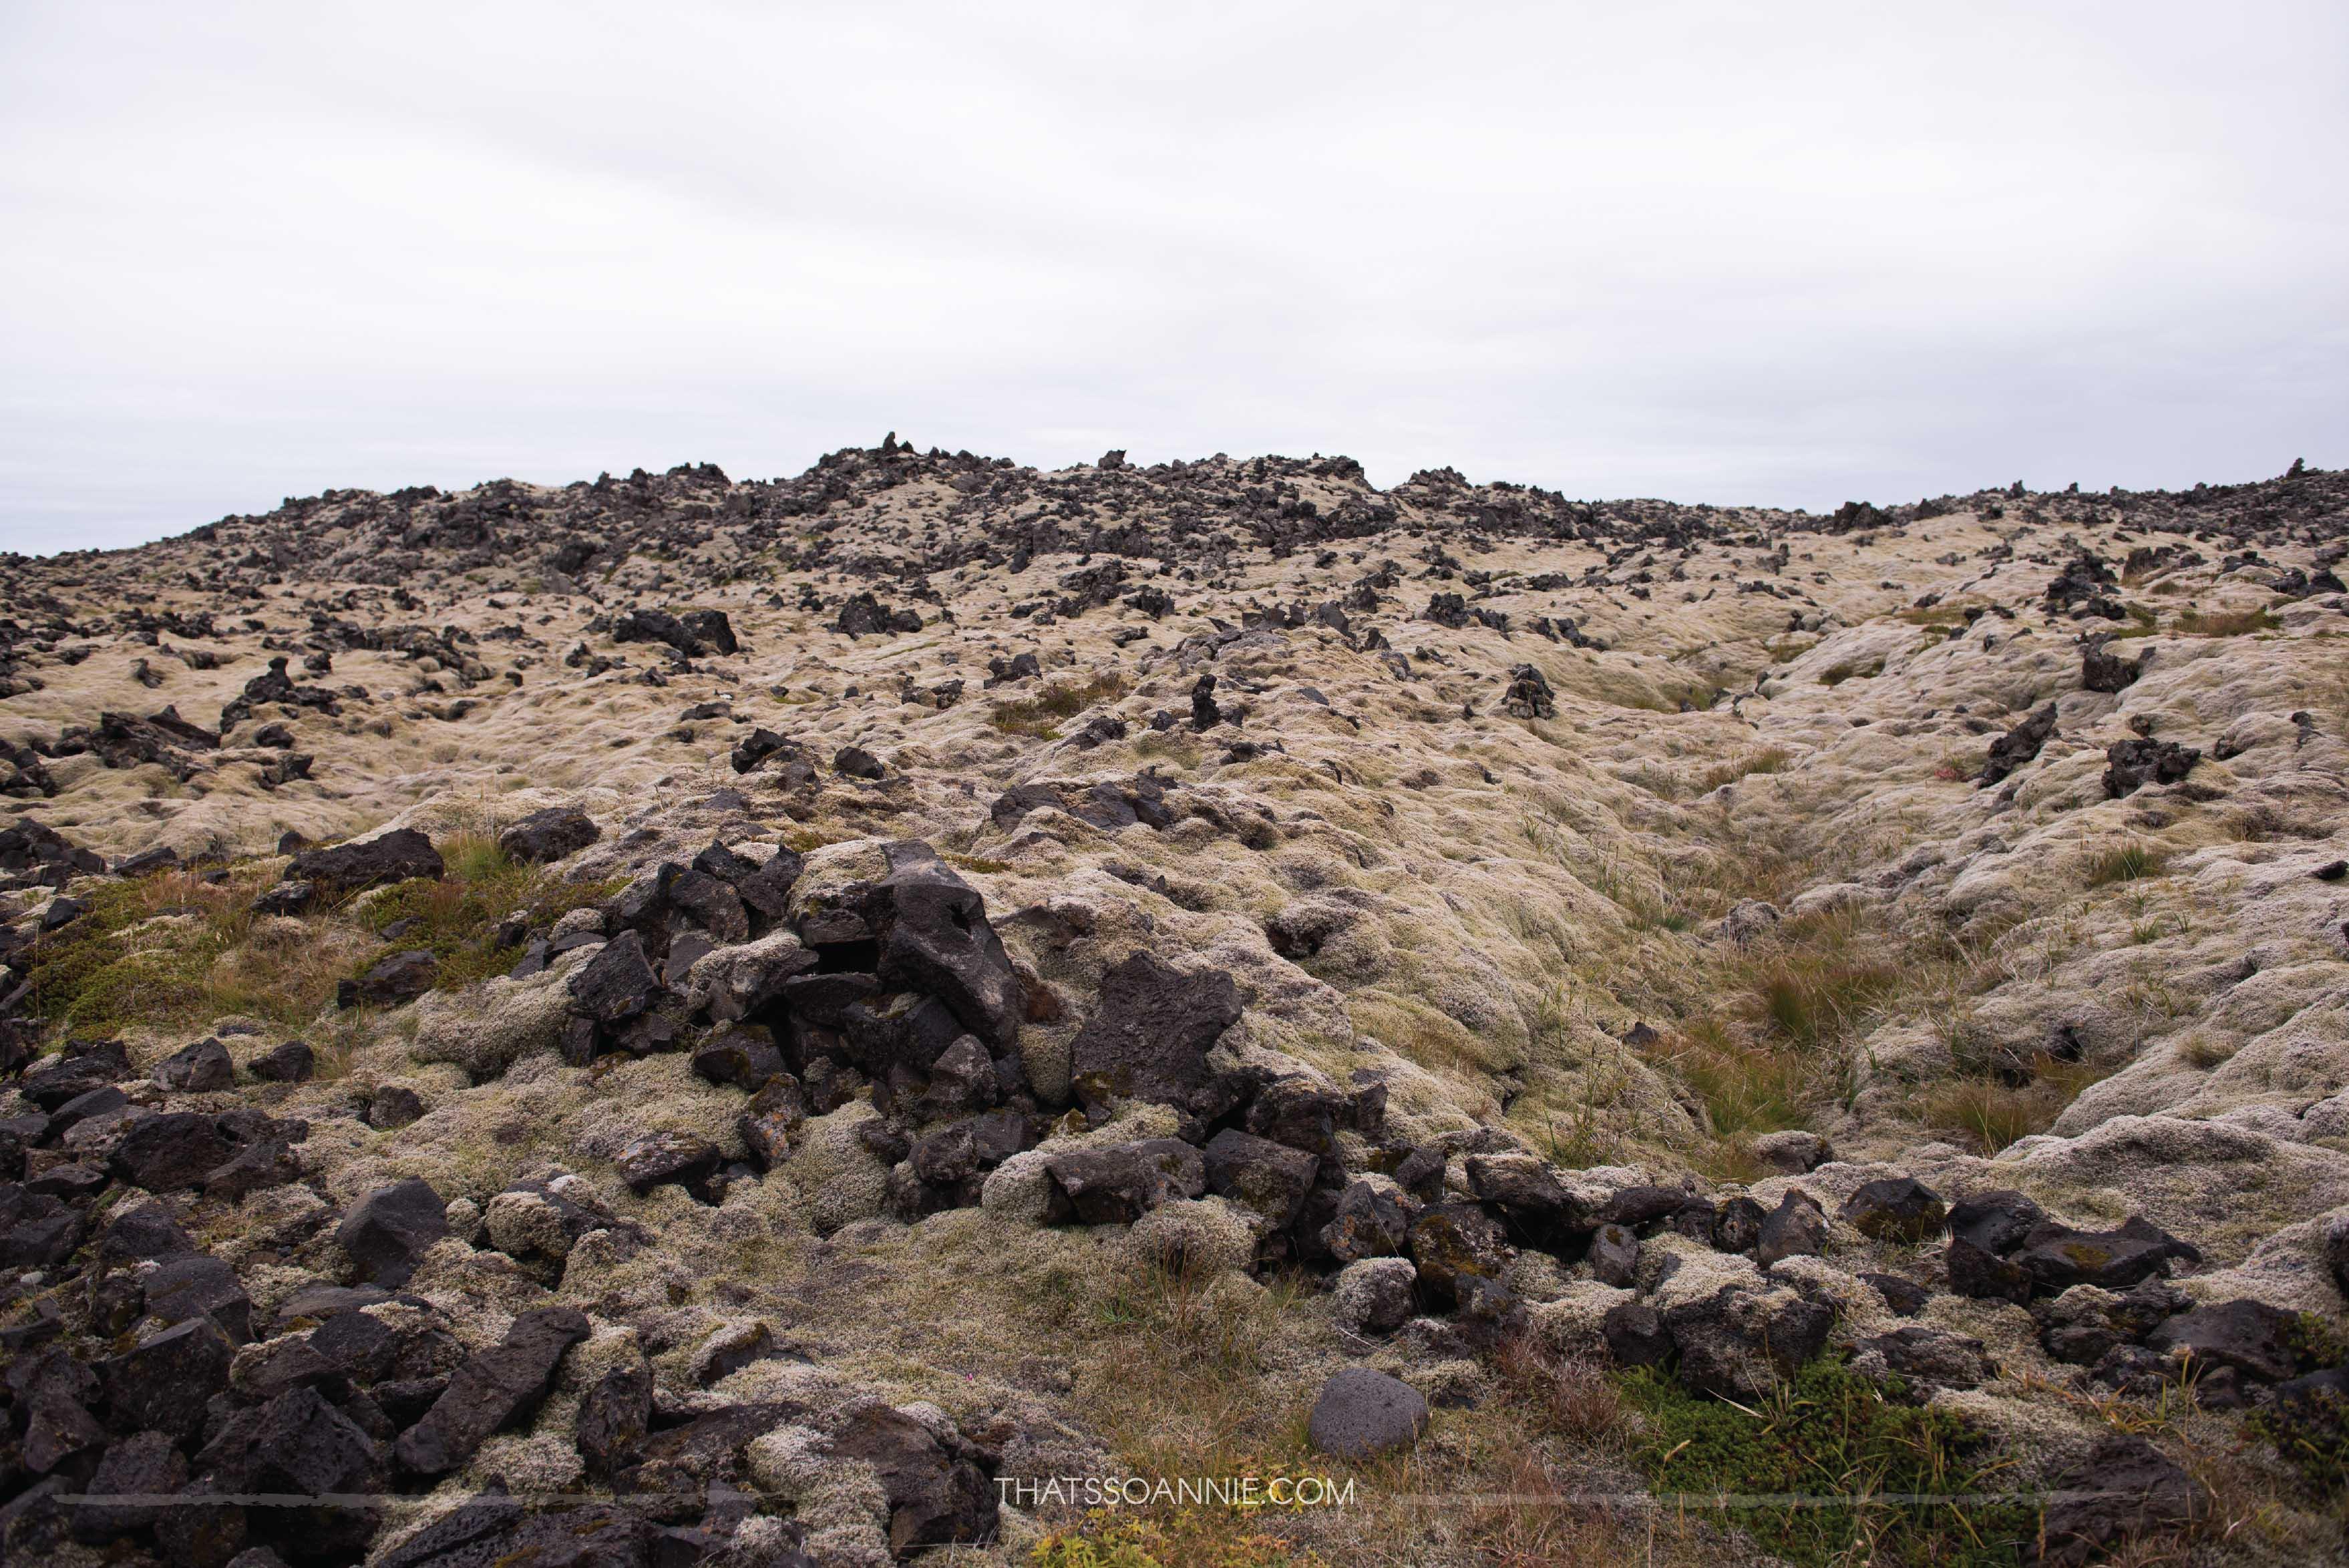 Lava fields while driving towardsDjúpalónssandur, a black pebble beach | Exploring the Snæfellsnes Peninsula, Iceland | www.thatssoannie.com